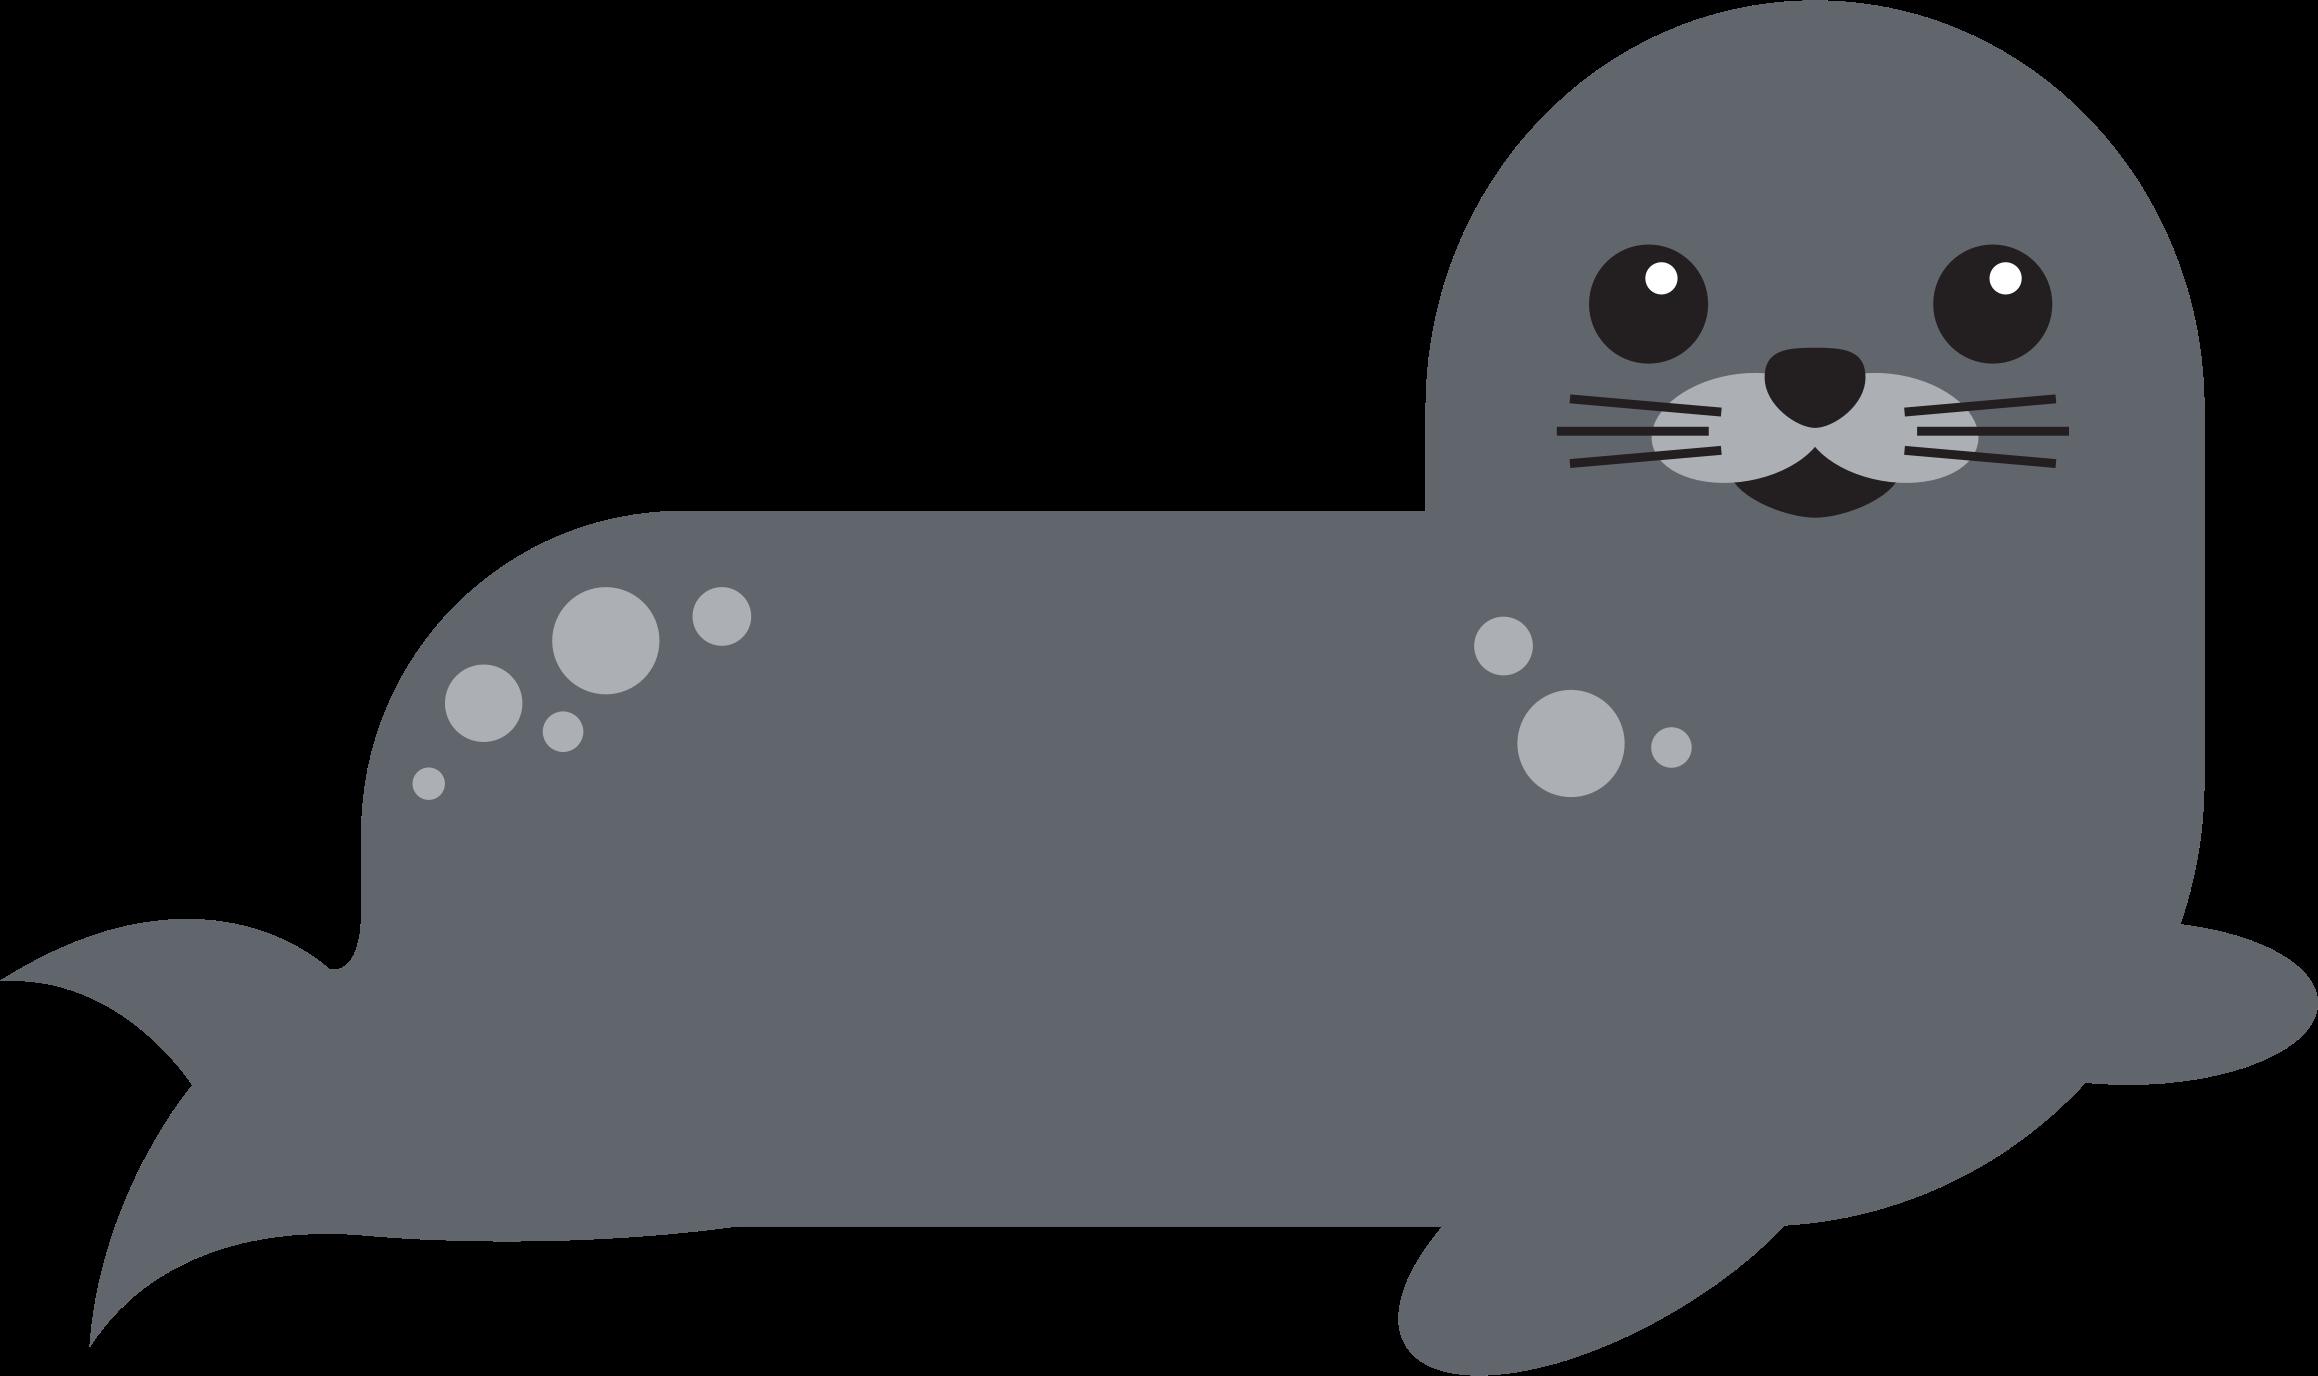 Head clipart walrus. Harbor seal big image